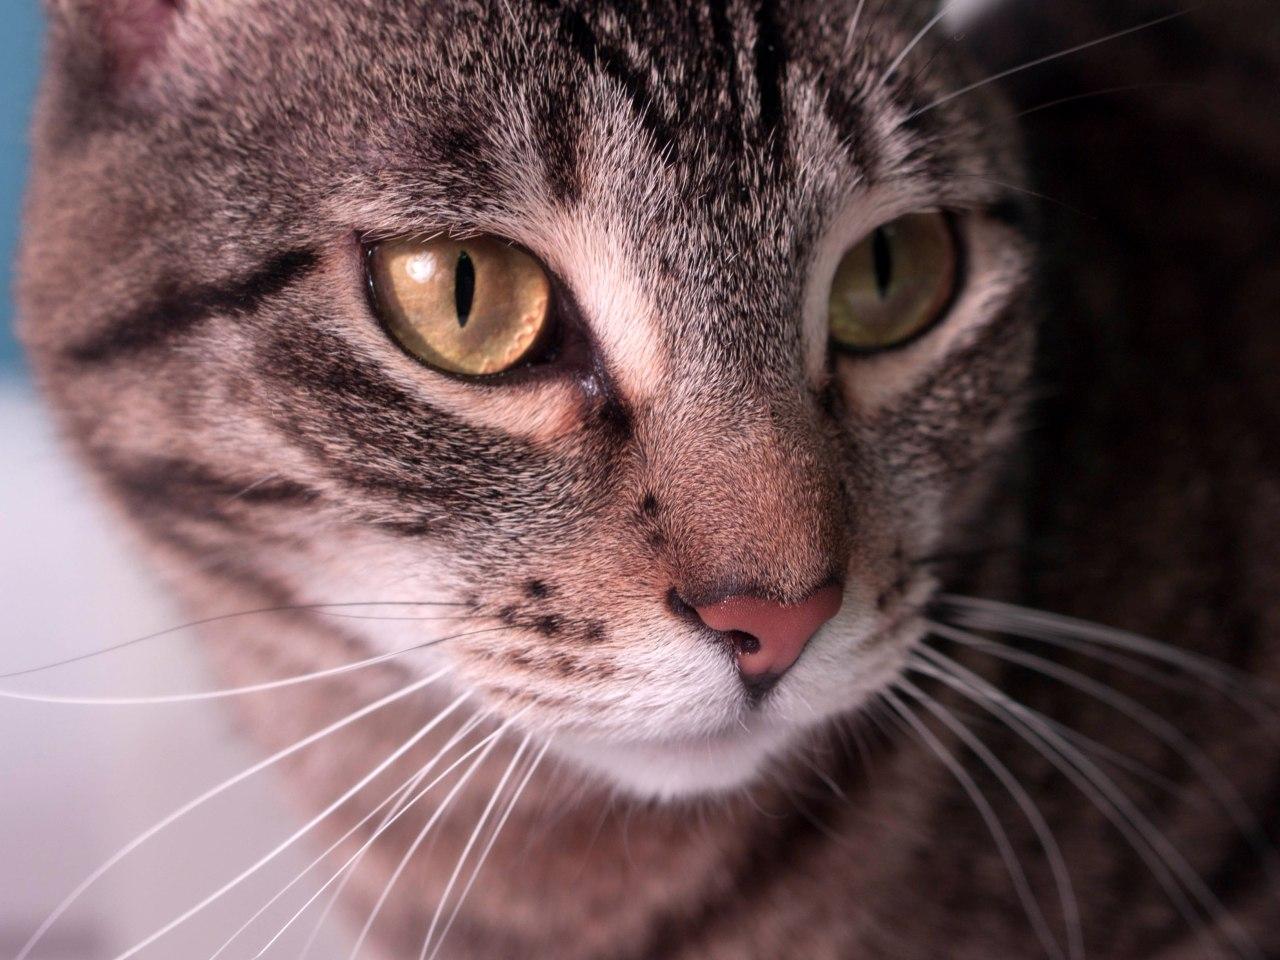 My cat, Boston